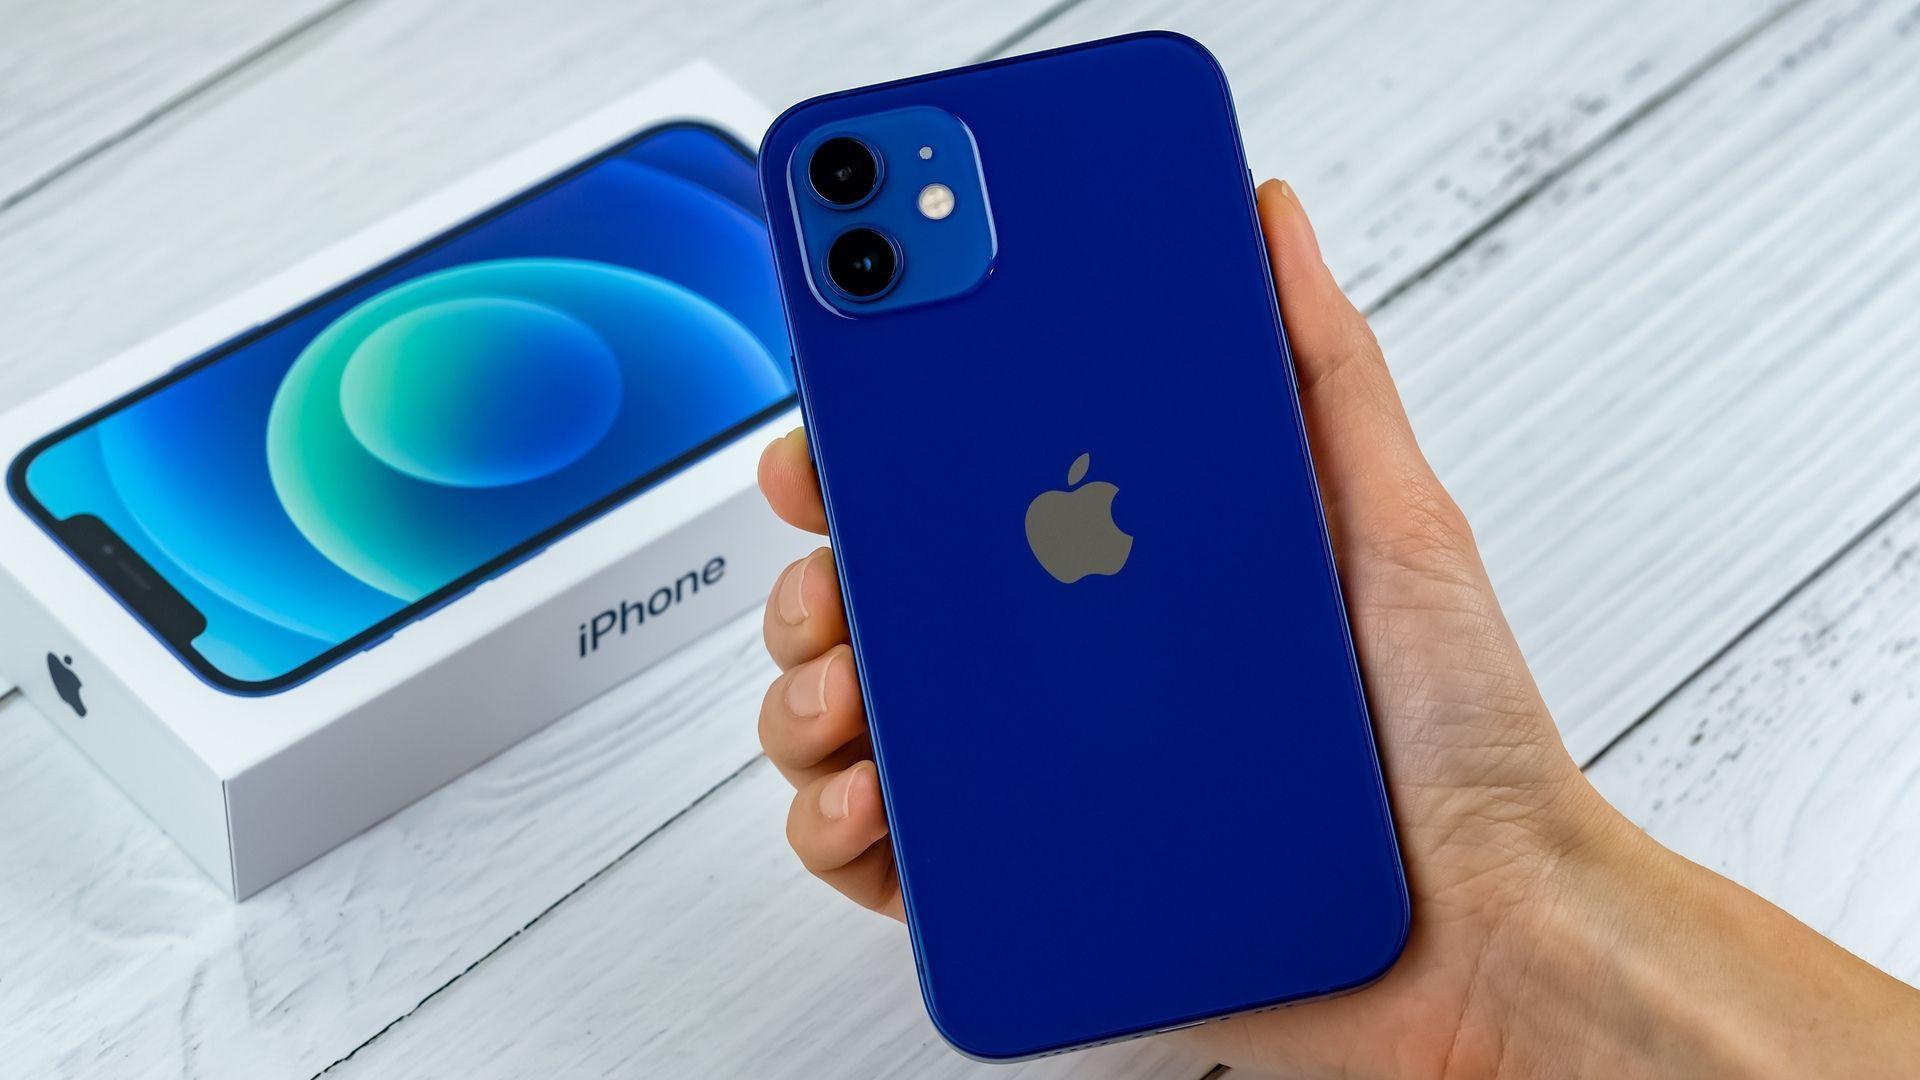 Design do iPhone 12 (Foto: Shutterstock)